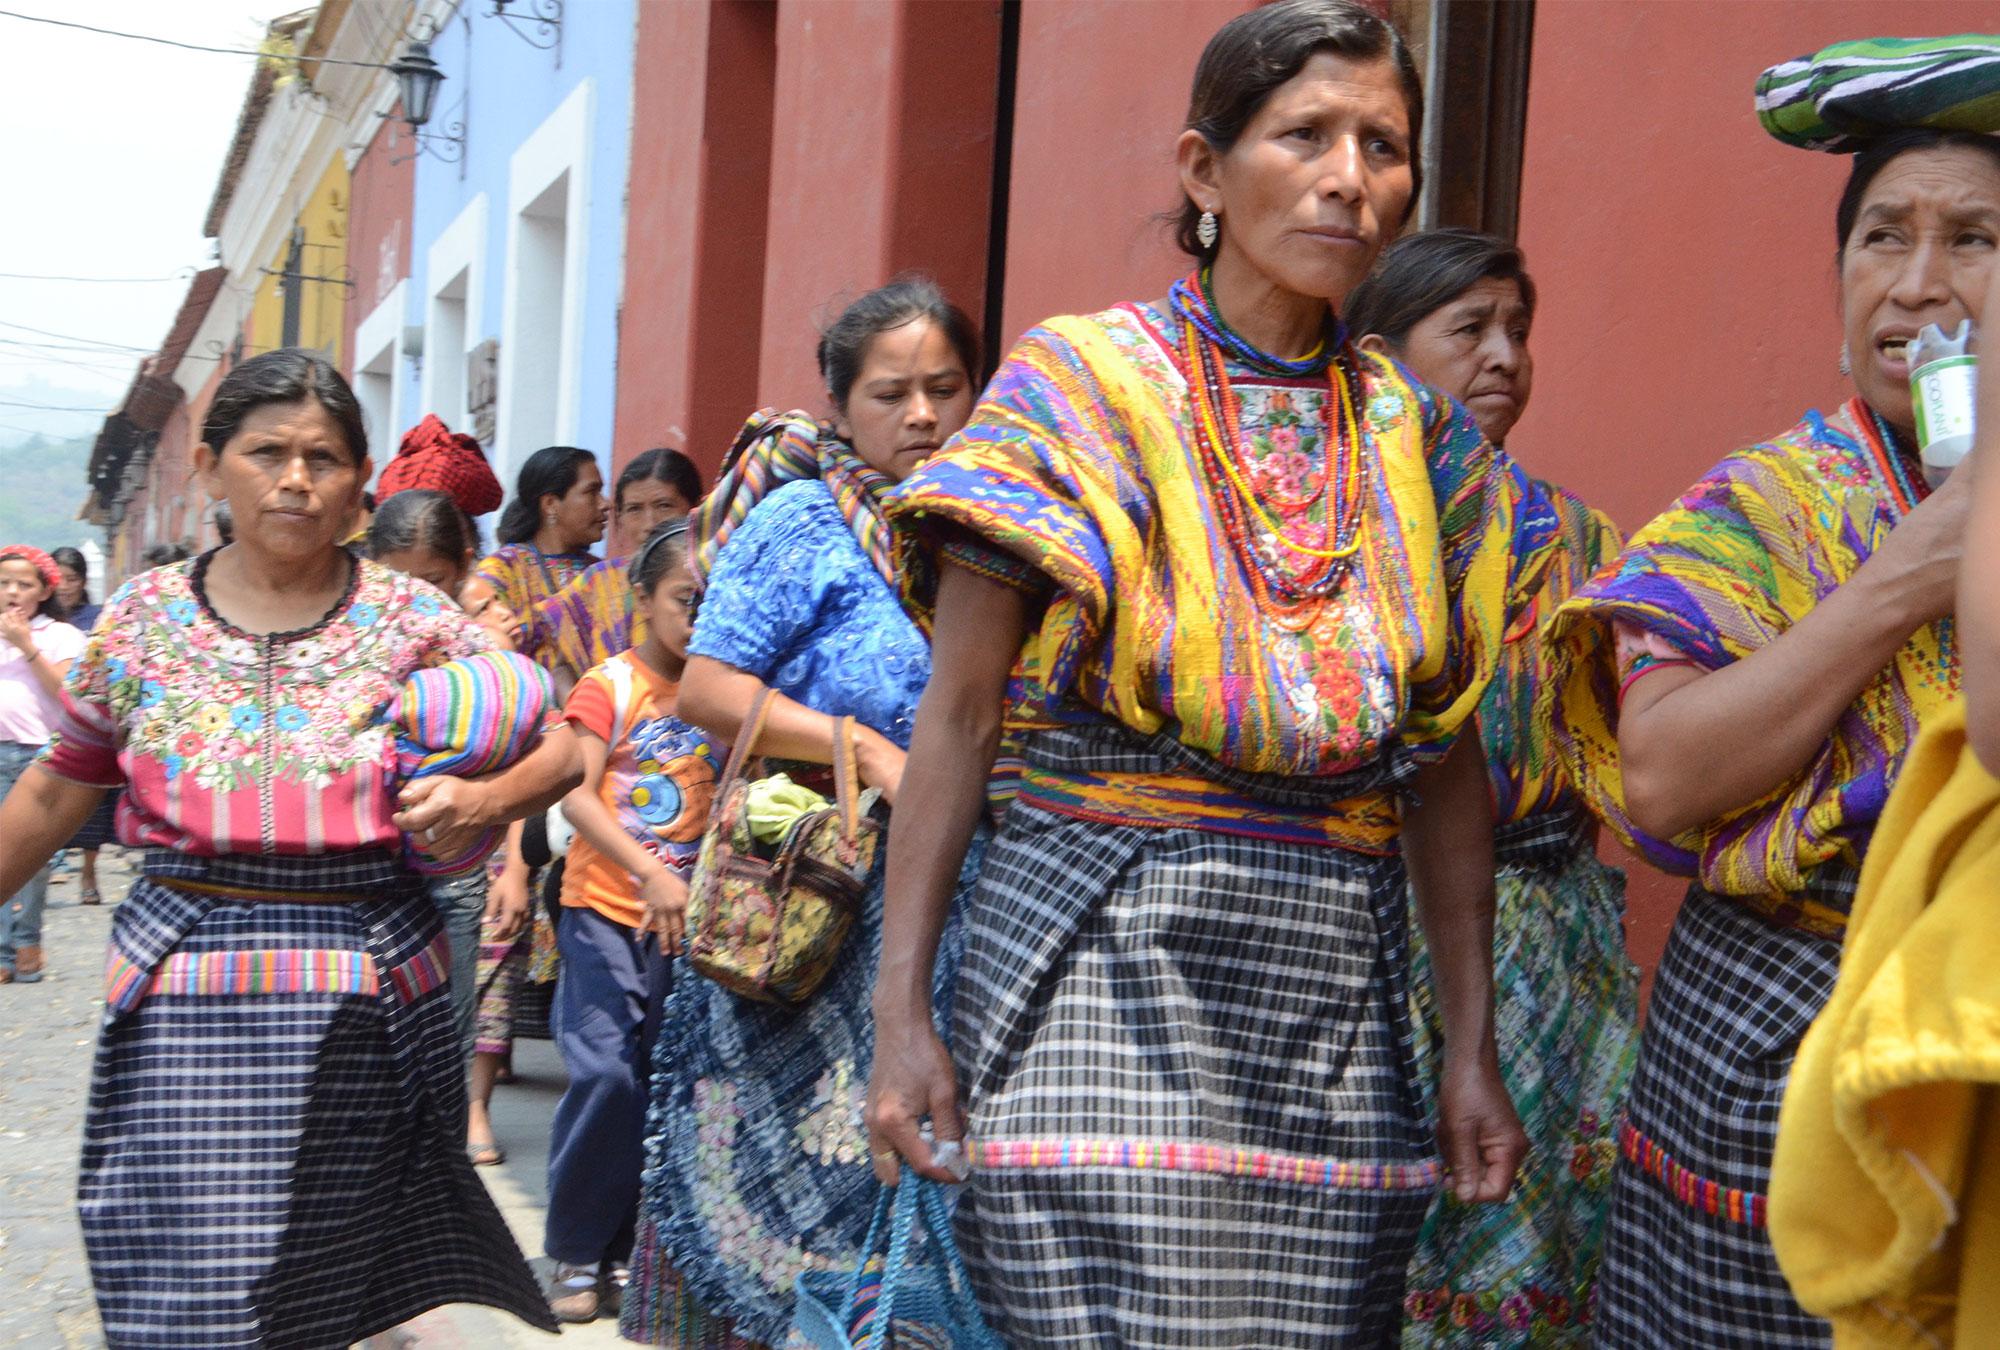 Women in colorful Guatemalan clothing